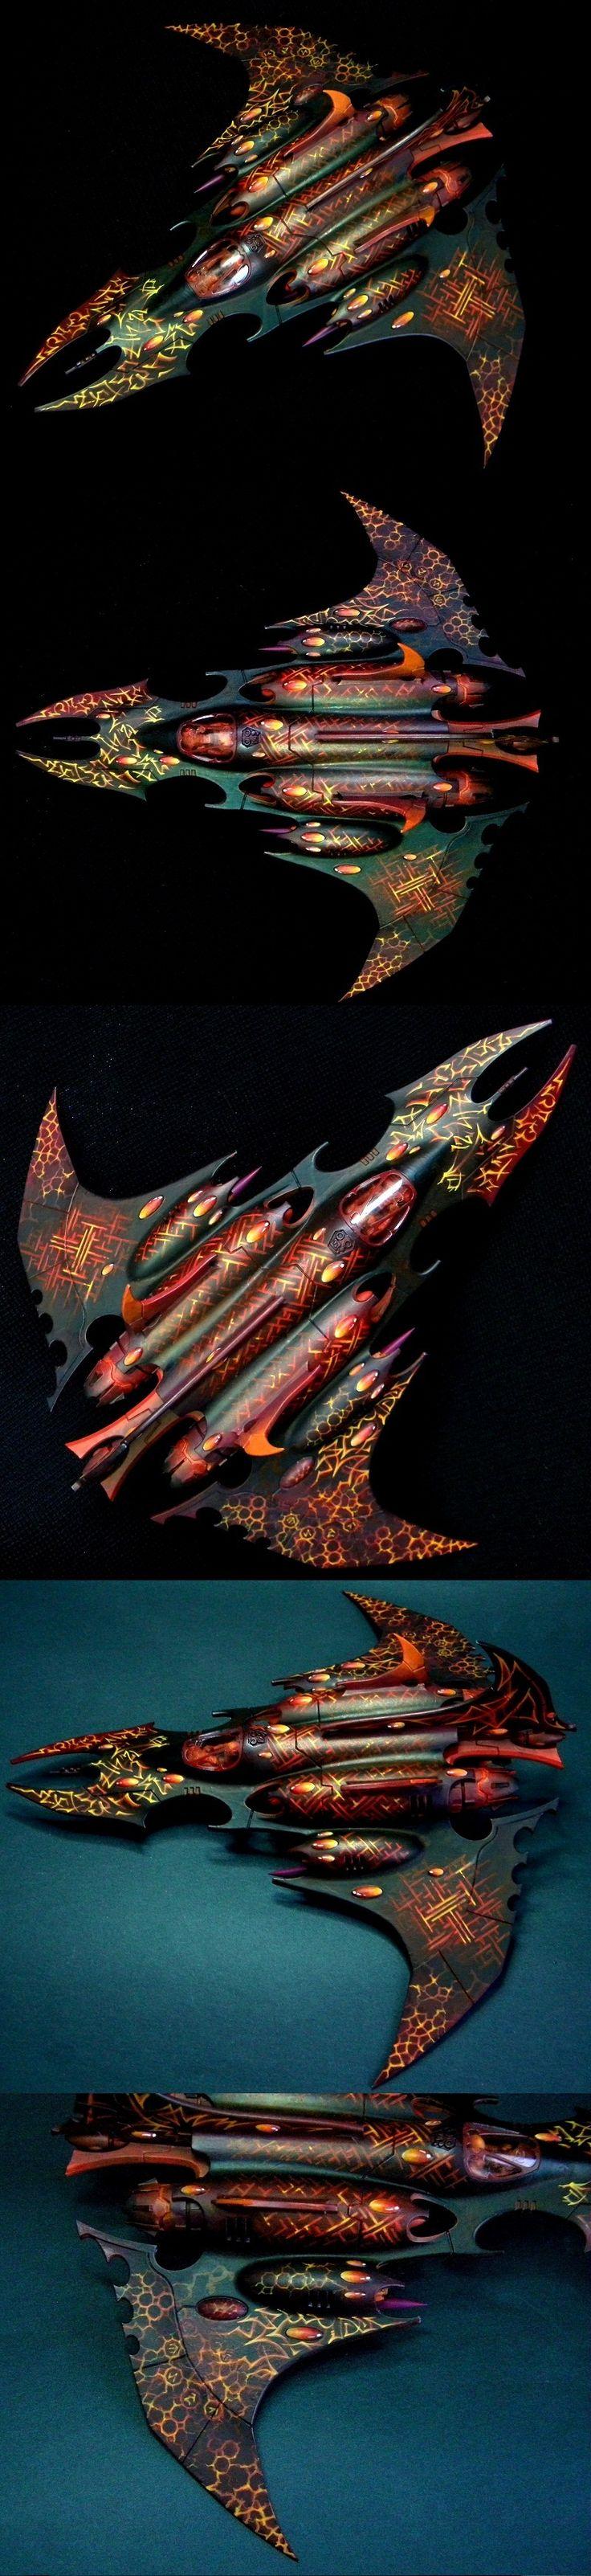 40k - The Reflection of Darkness, Dark Eldar Razorwing by Hors